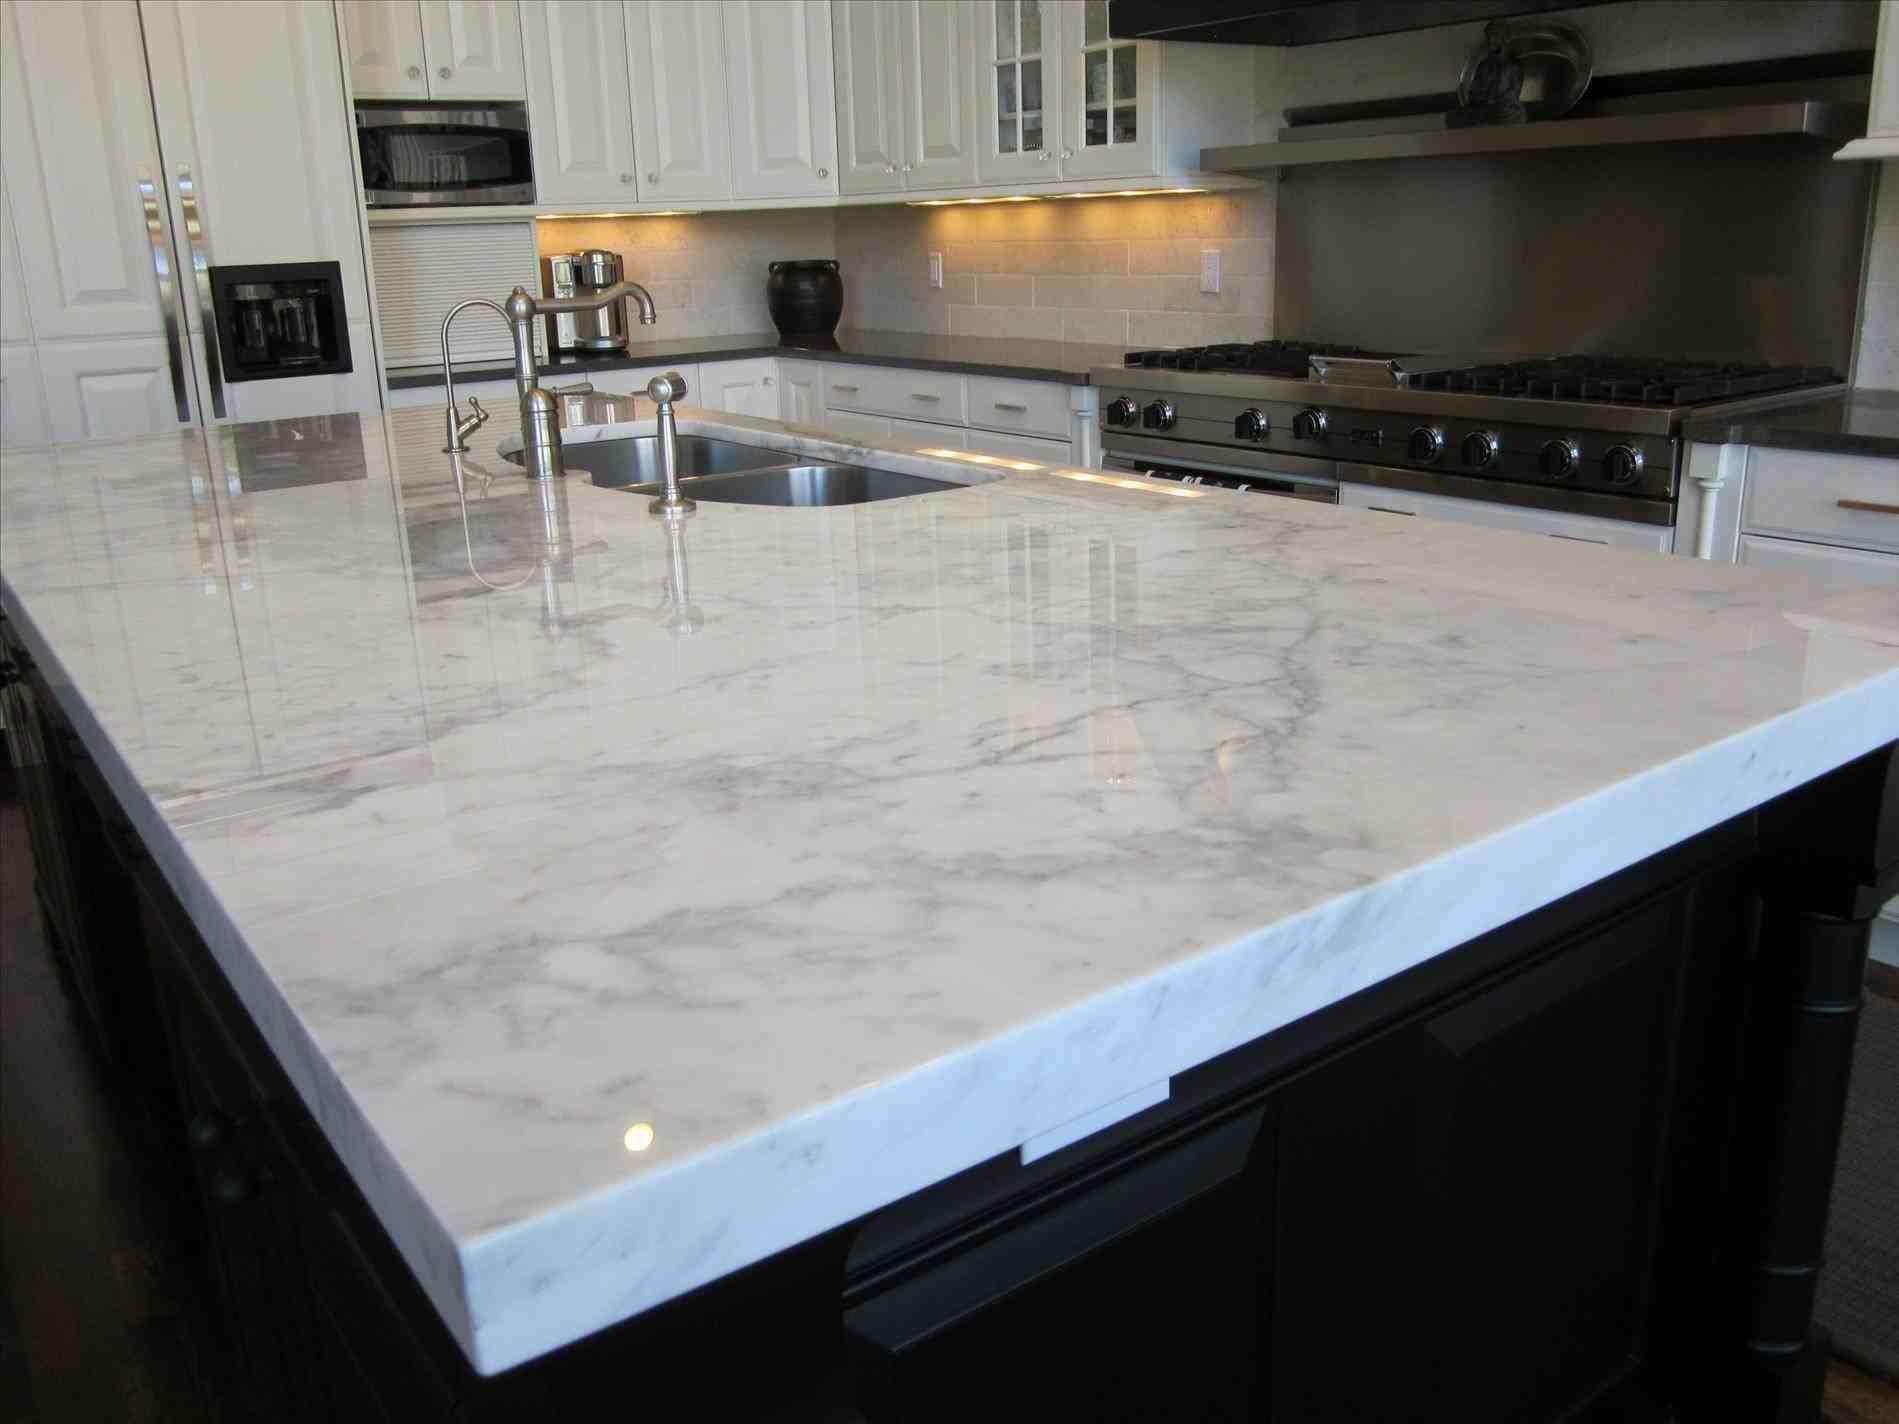 White Princess Granite Countertop Quartz Kitchen Countertops Granite Countertops Kitchen Gray Quartz Countertops